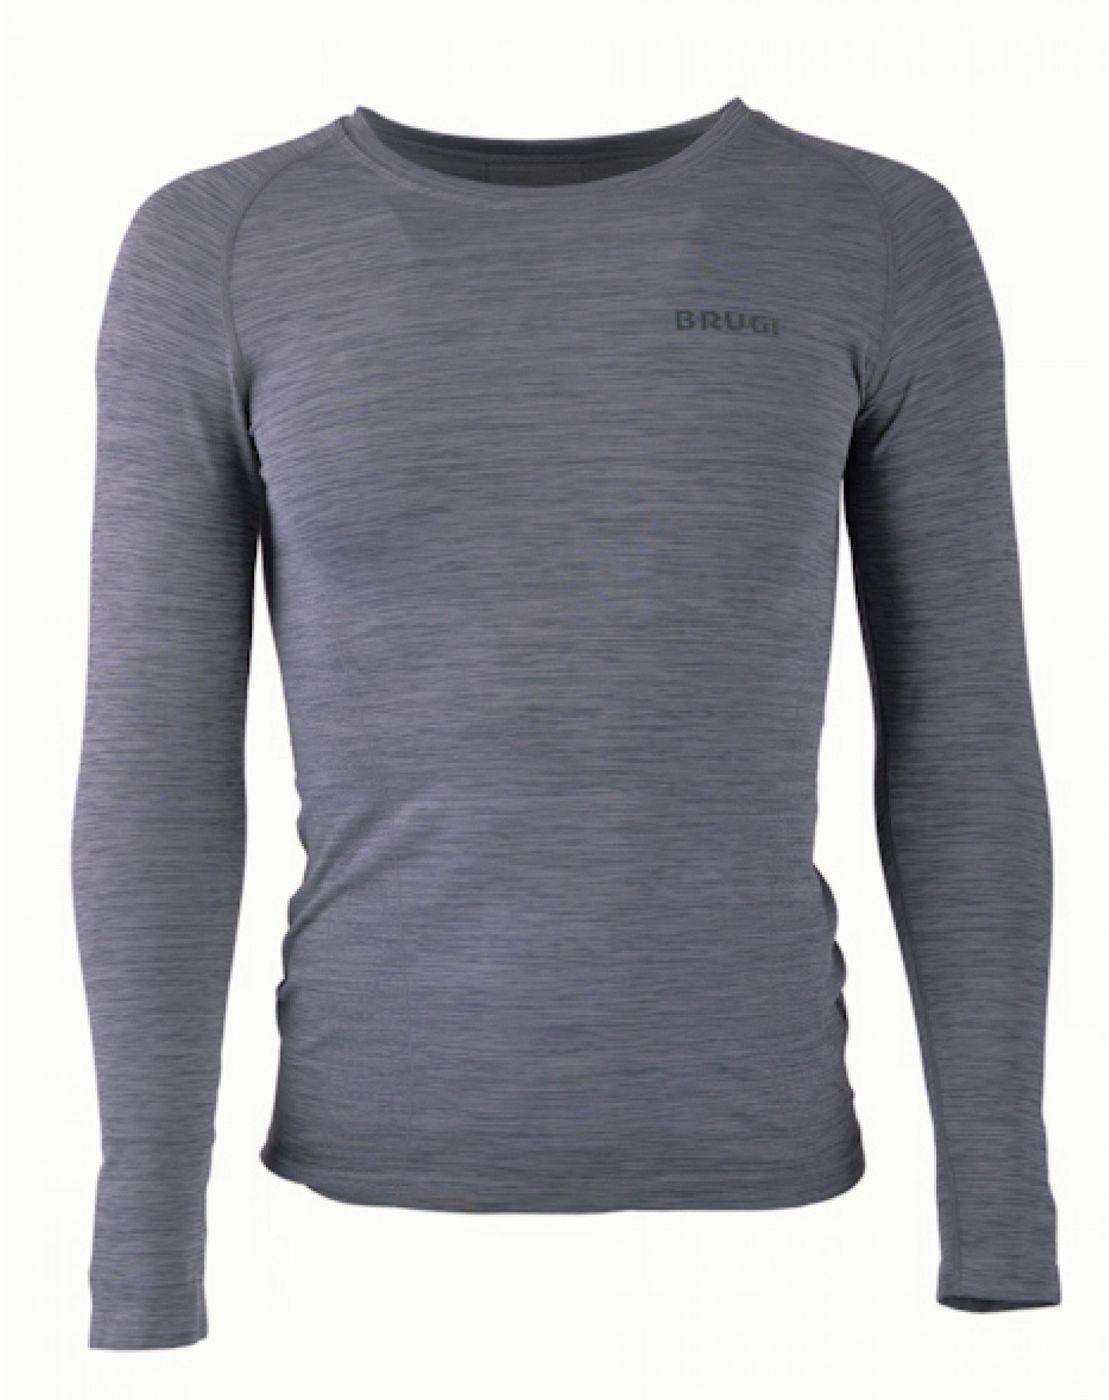 Brugi Koszulka termoaktywna męska Seamless 4RB3 grigio nero 8300163014138